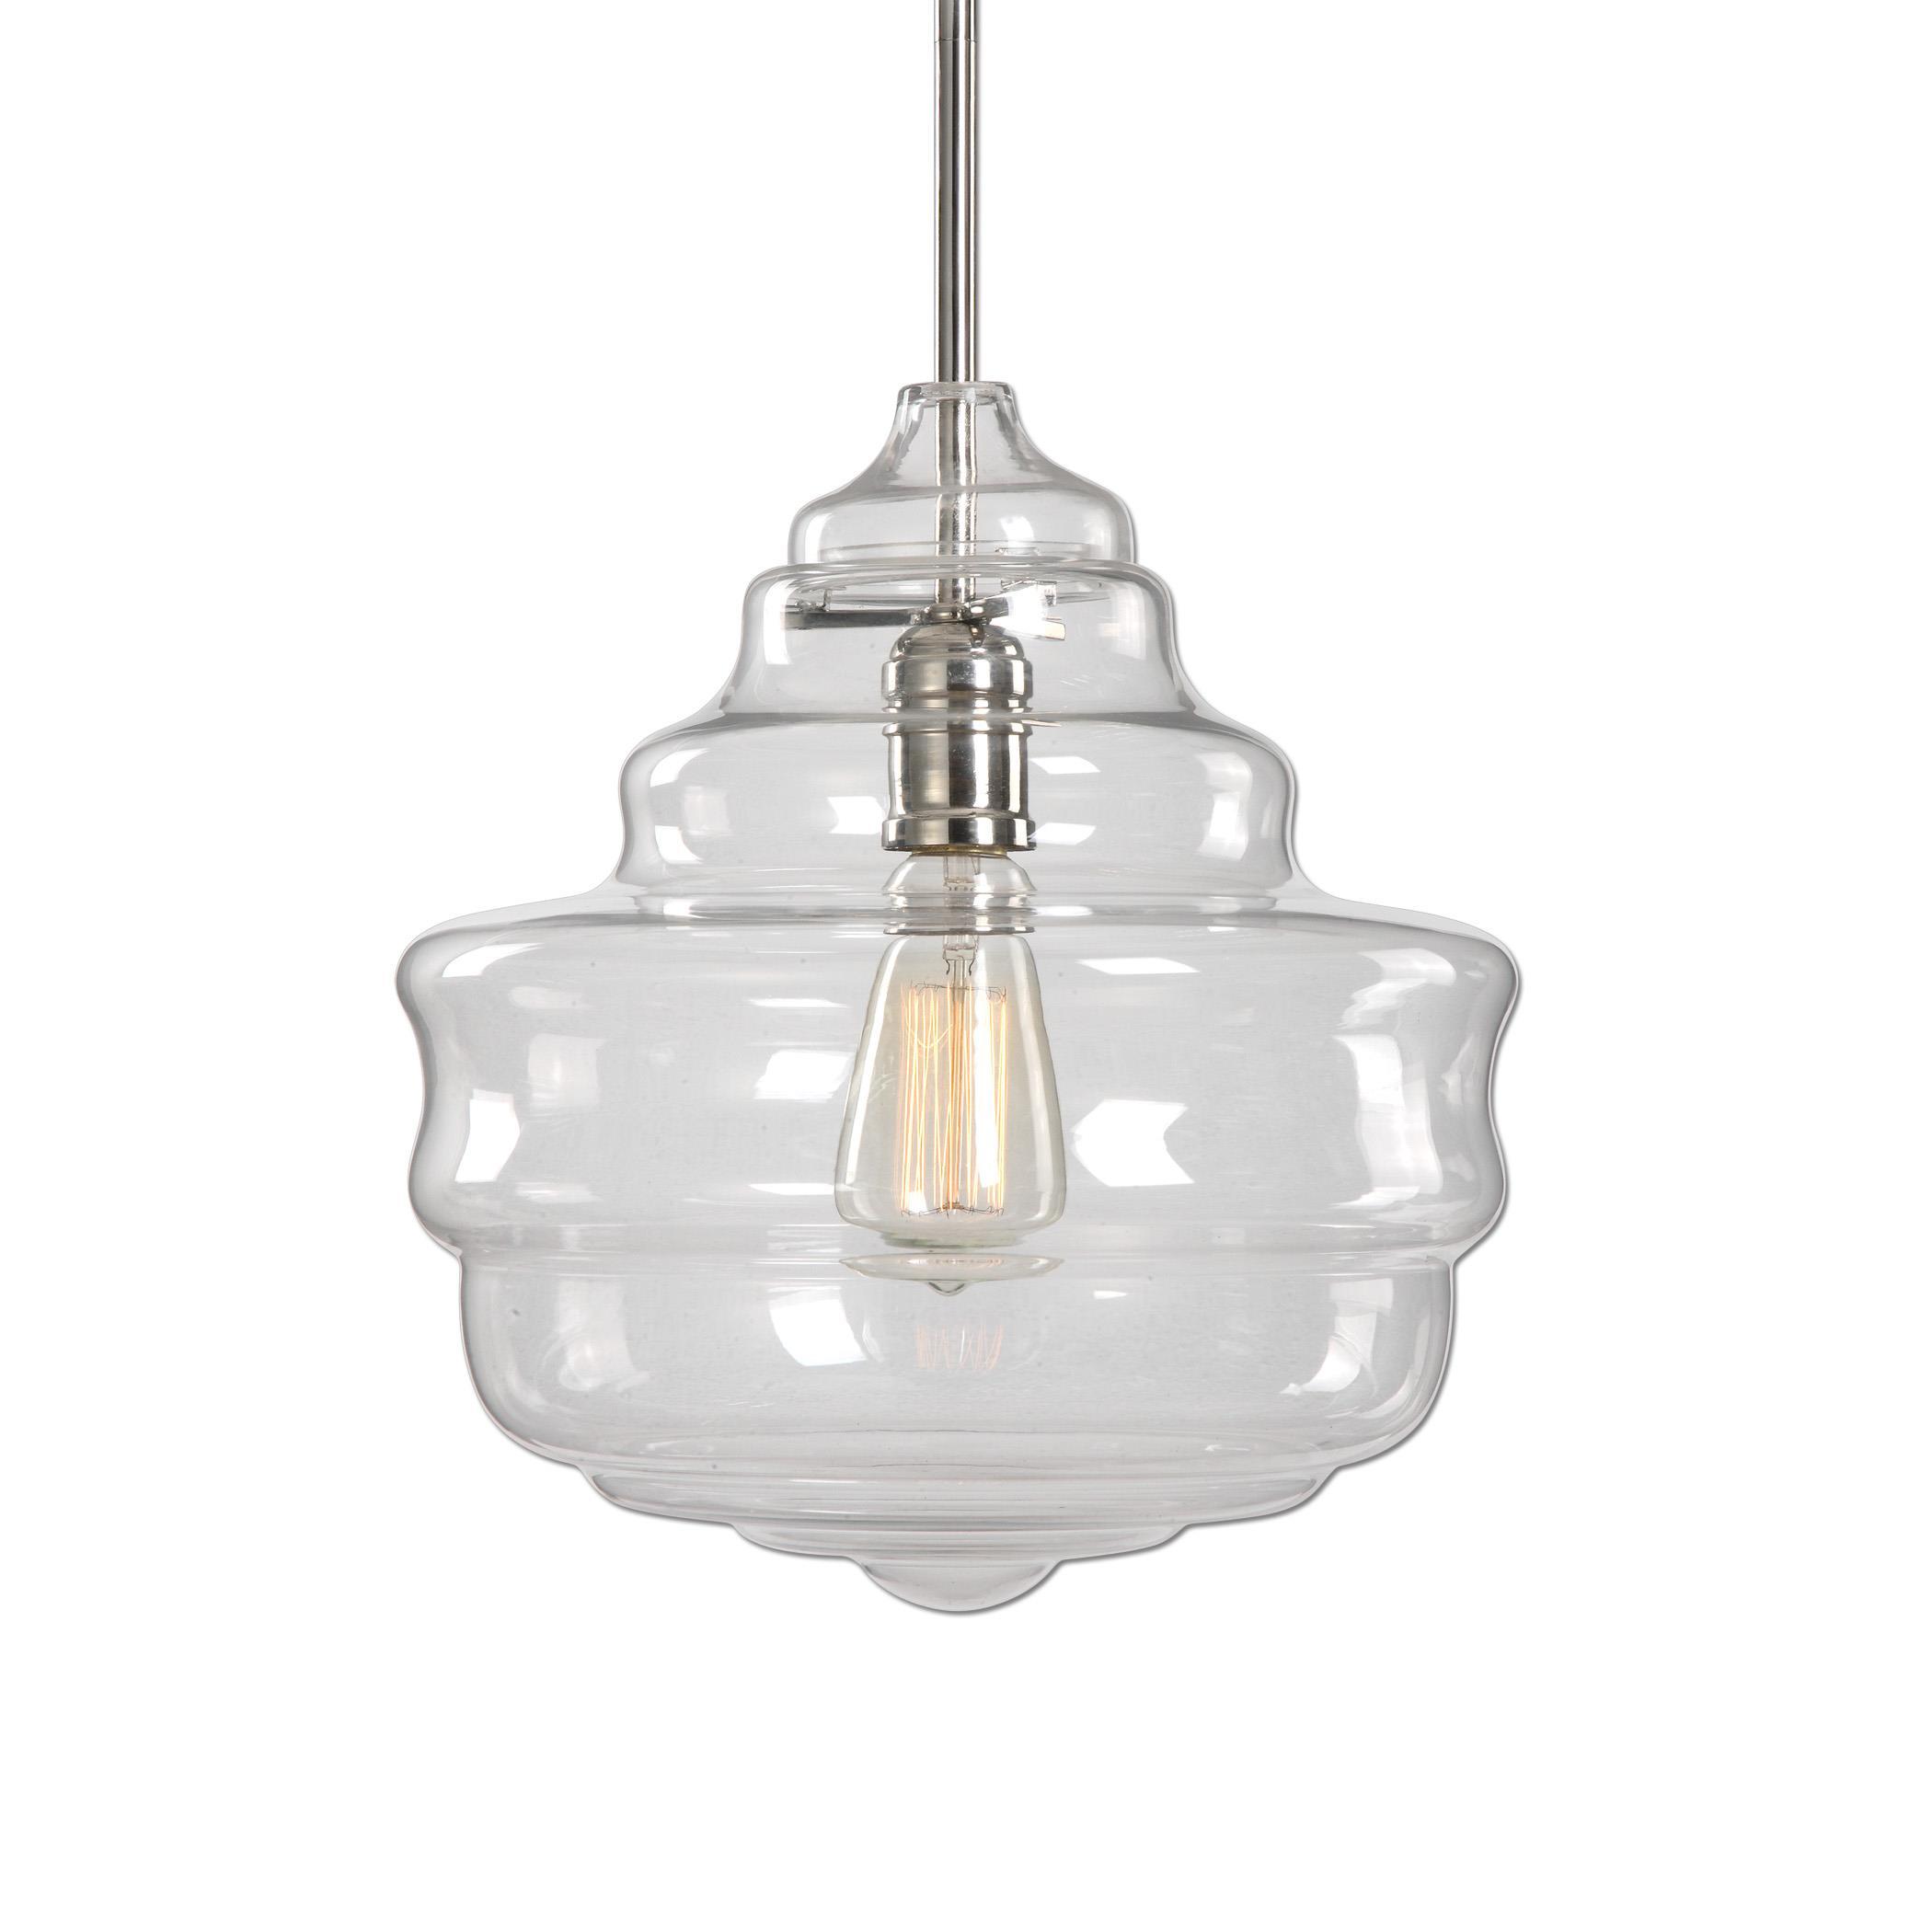 Uttermost Lighting Fixtures Bristol 1 Light Beehive Glass Pendant - Item Number: 22059